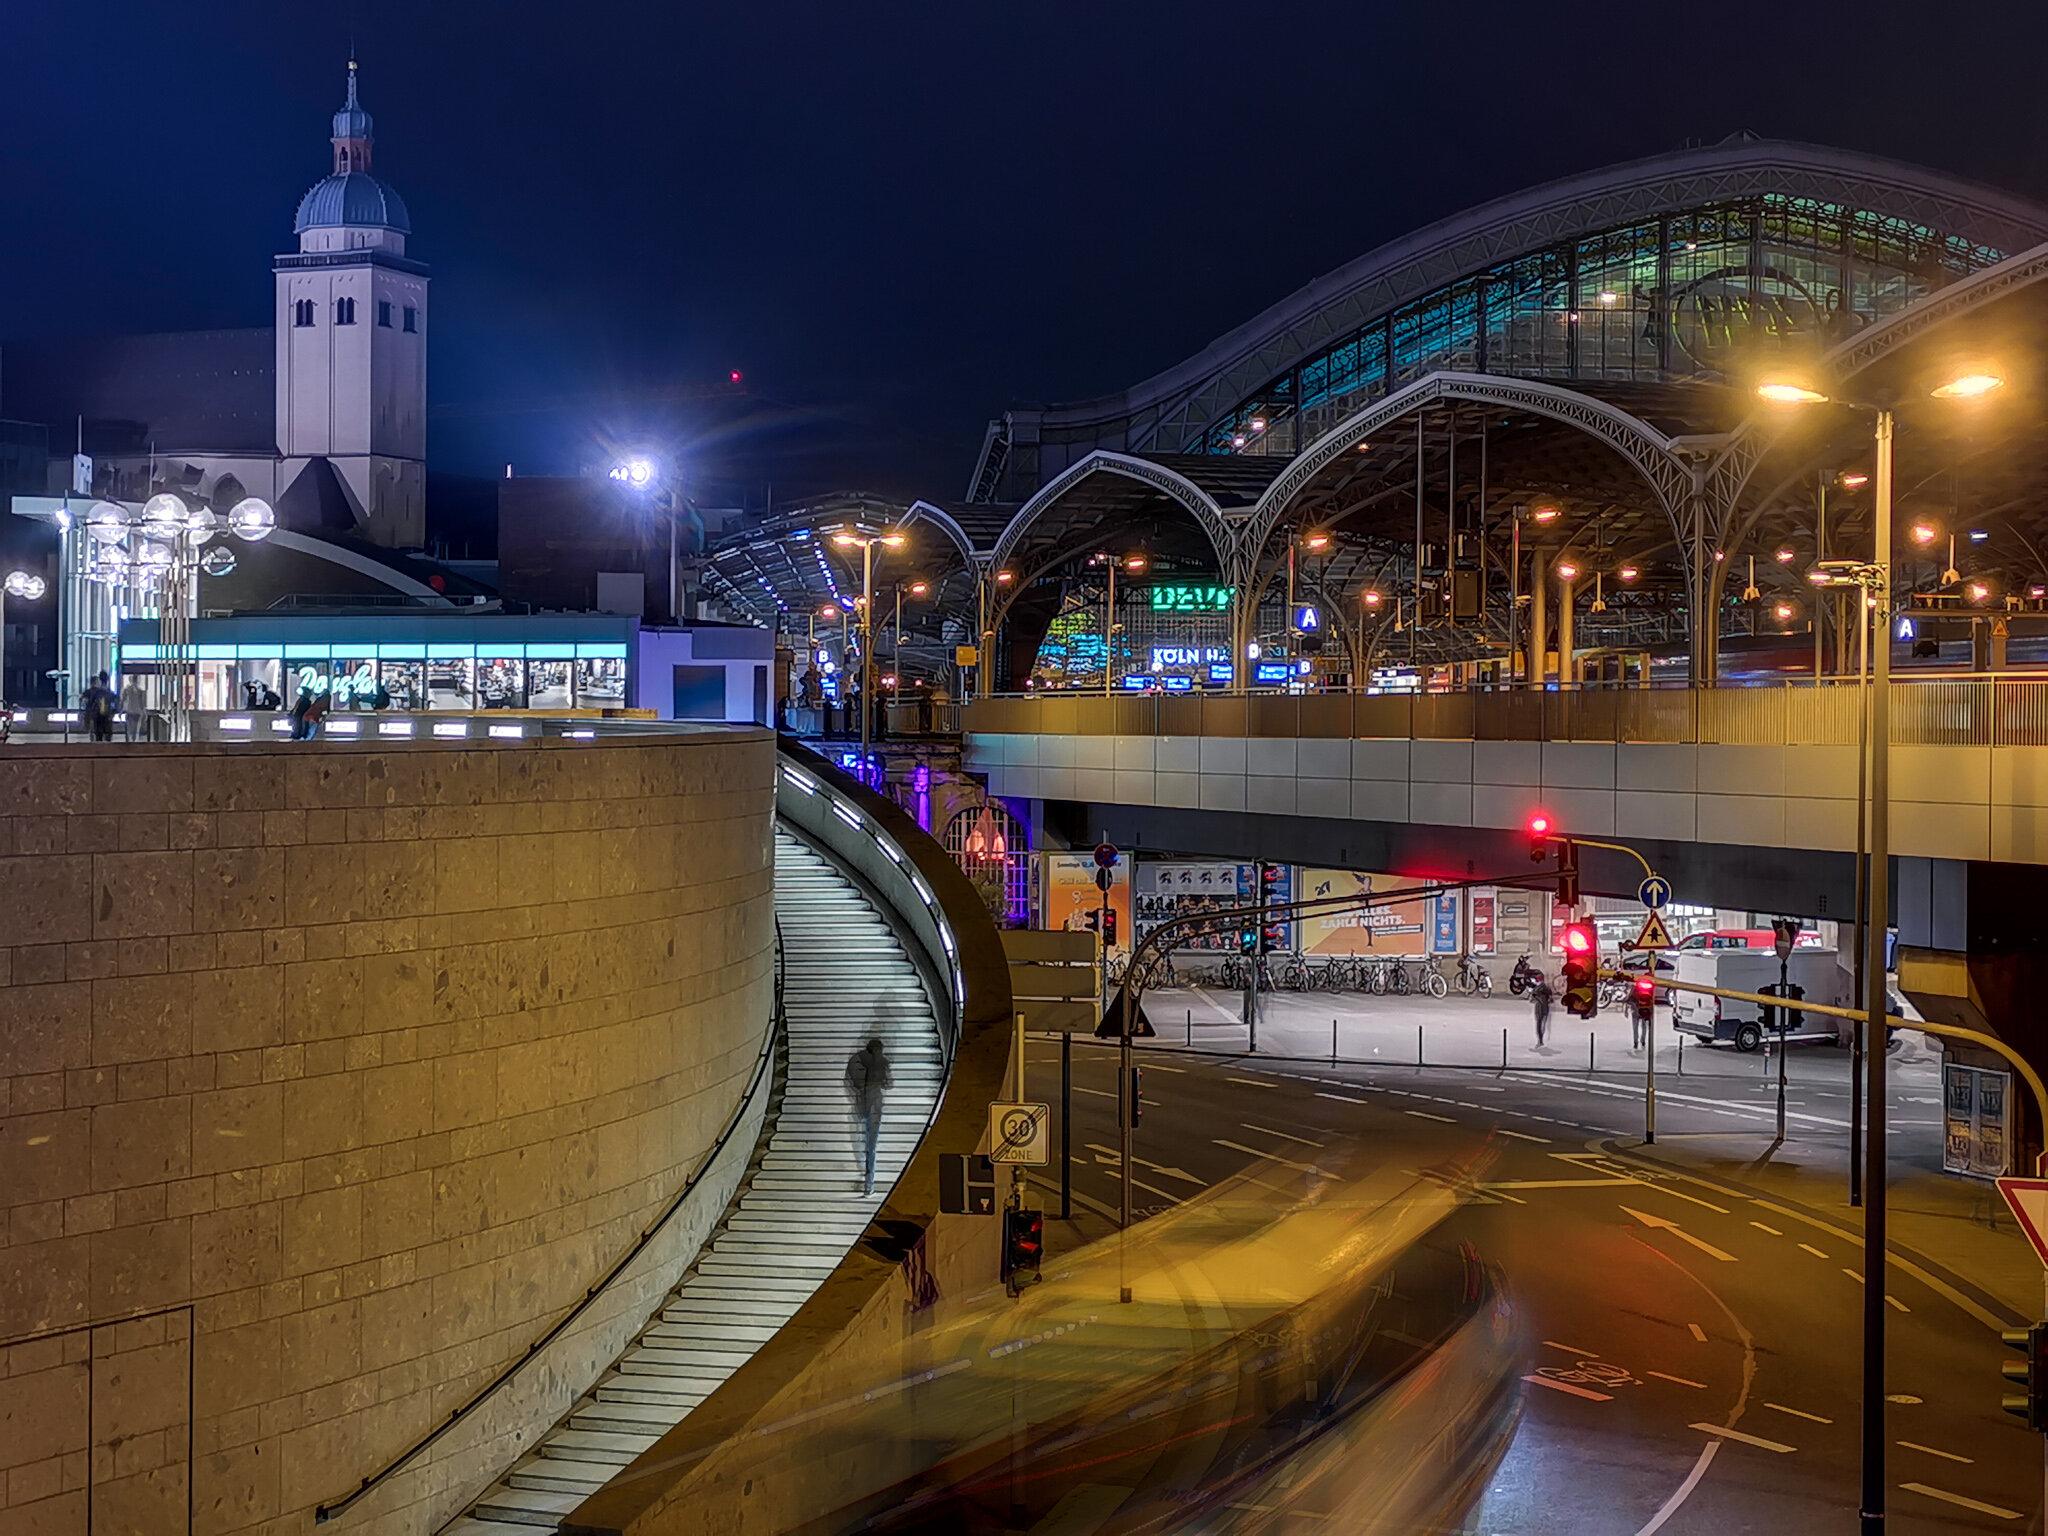 Nachtfoto Köln Smartphone Handy Kamera